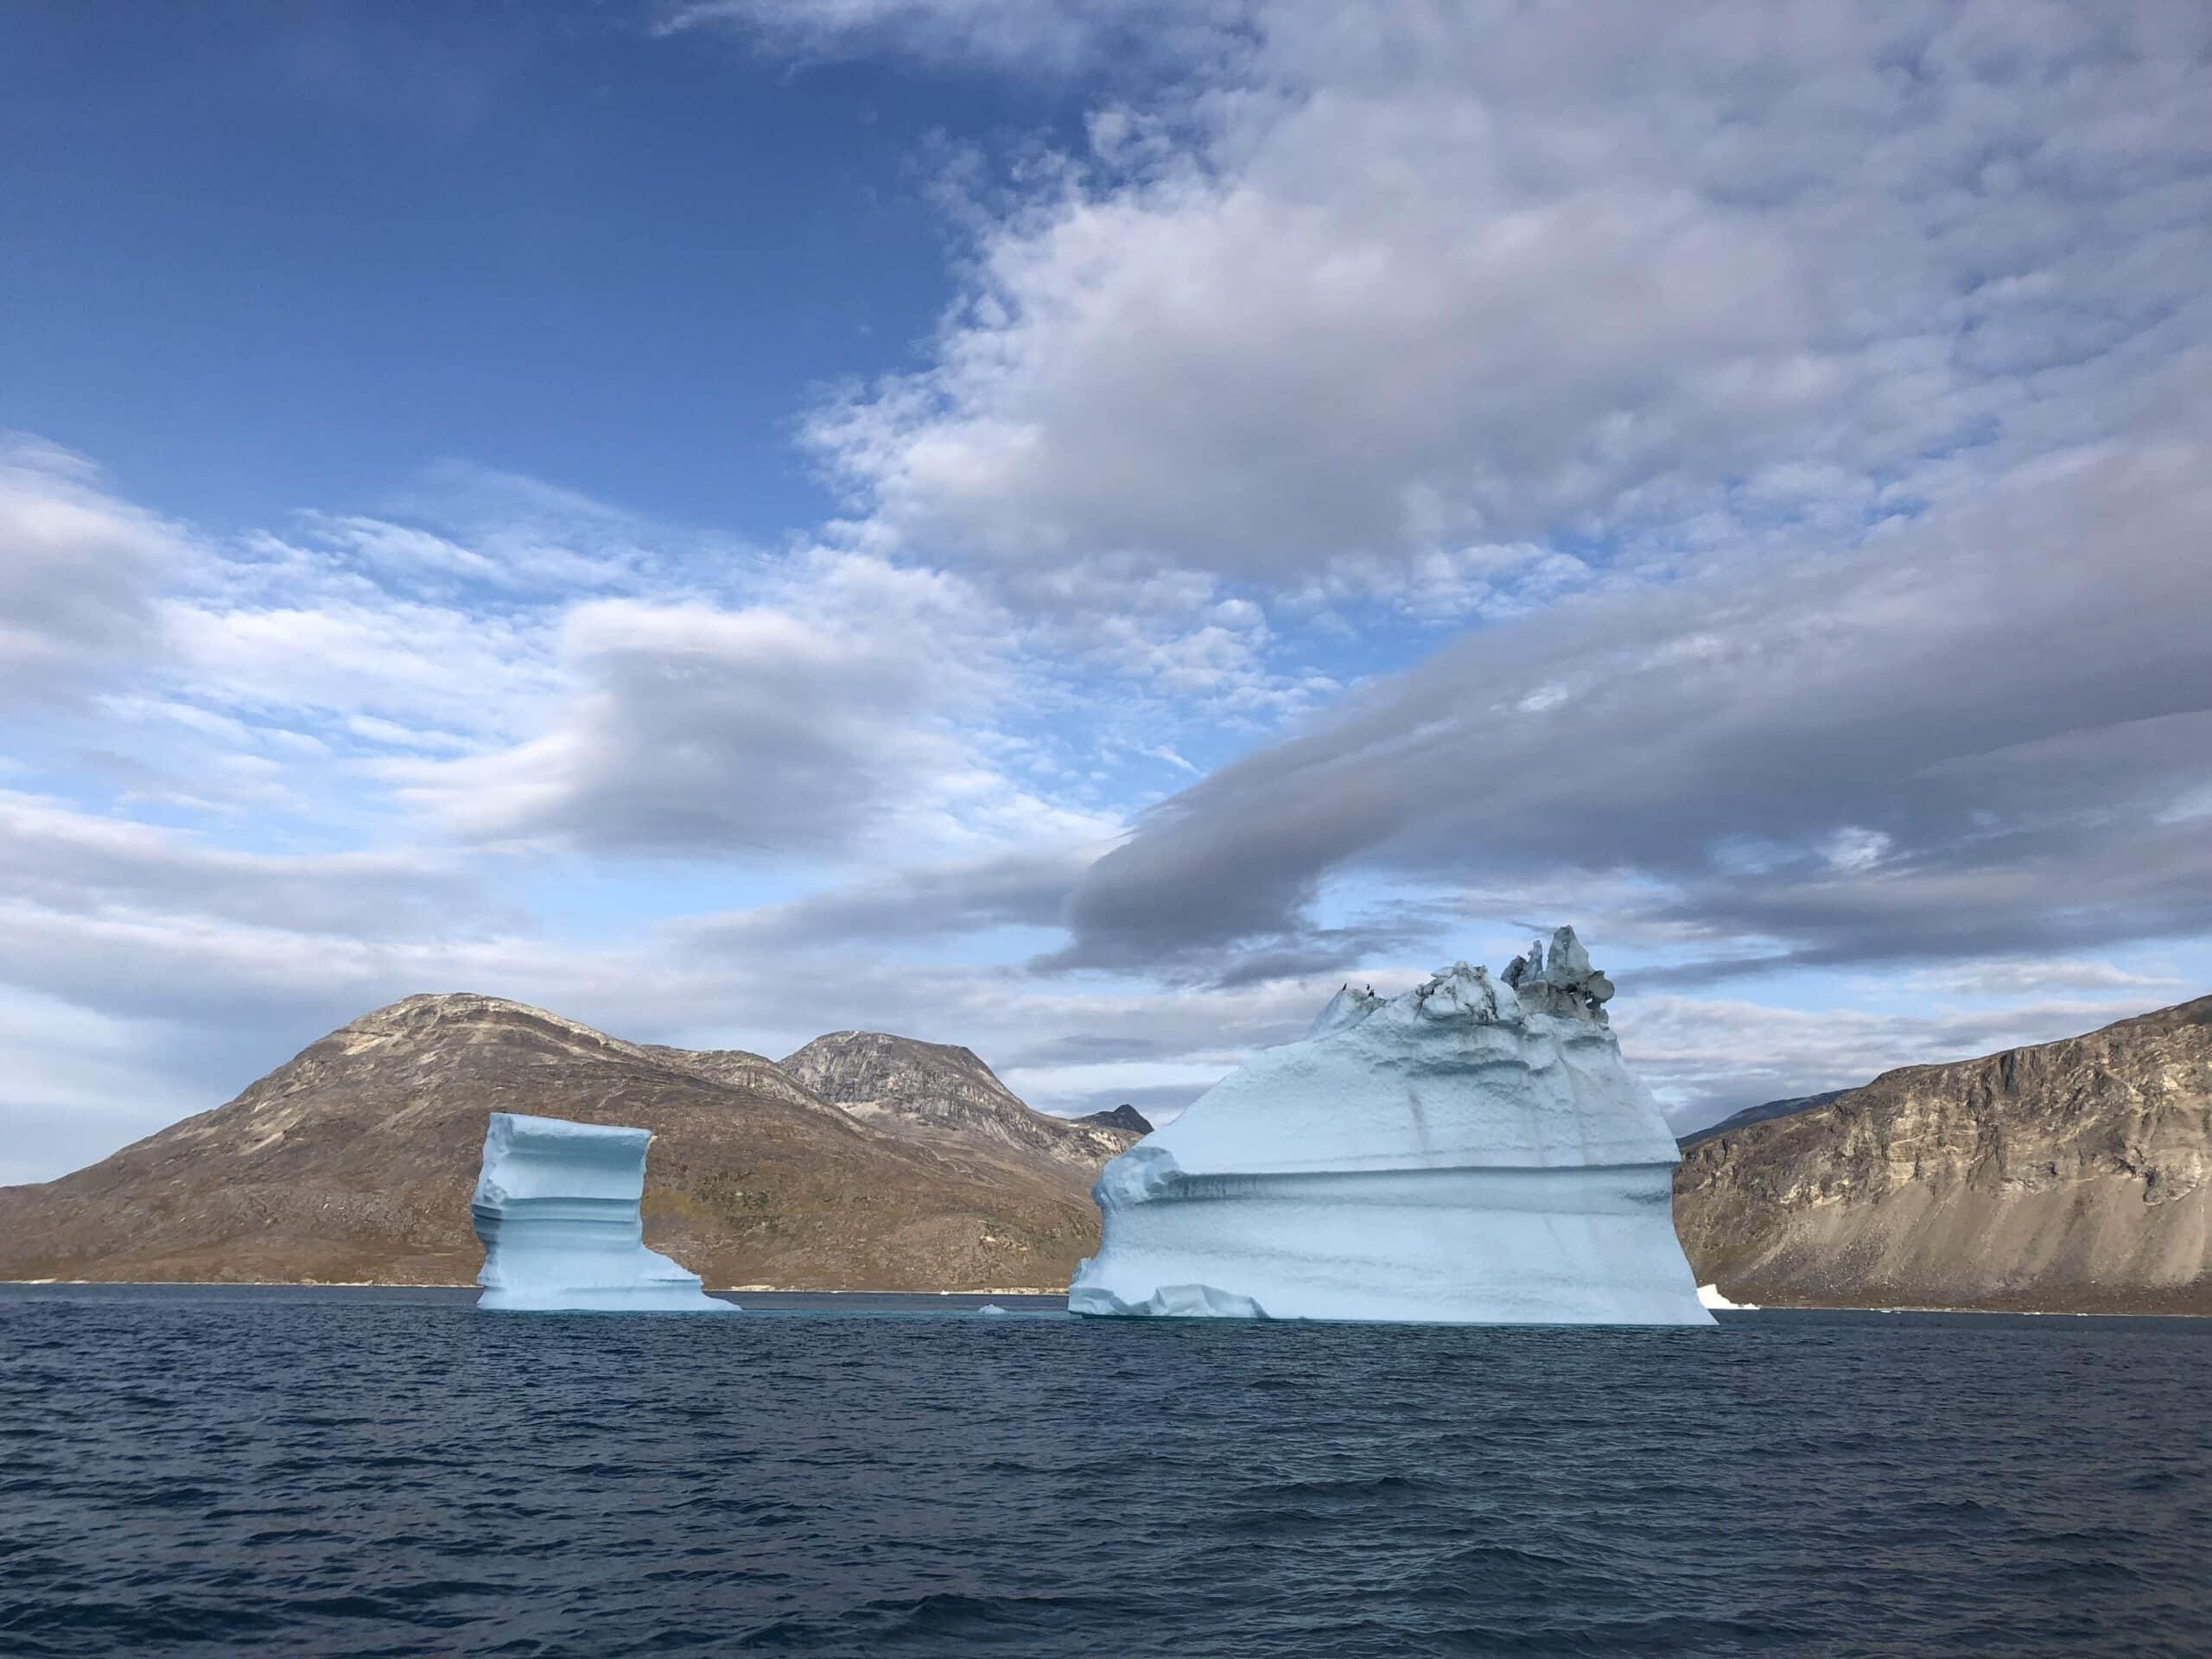 Coolest adventure in Nuuk Ice Fiord!